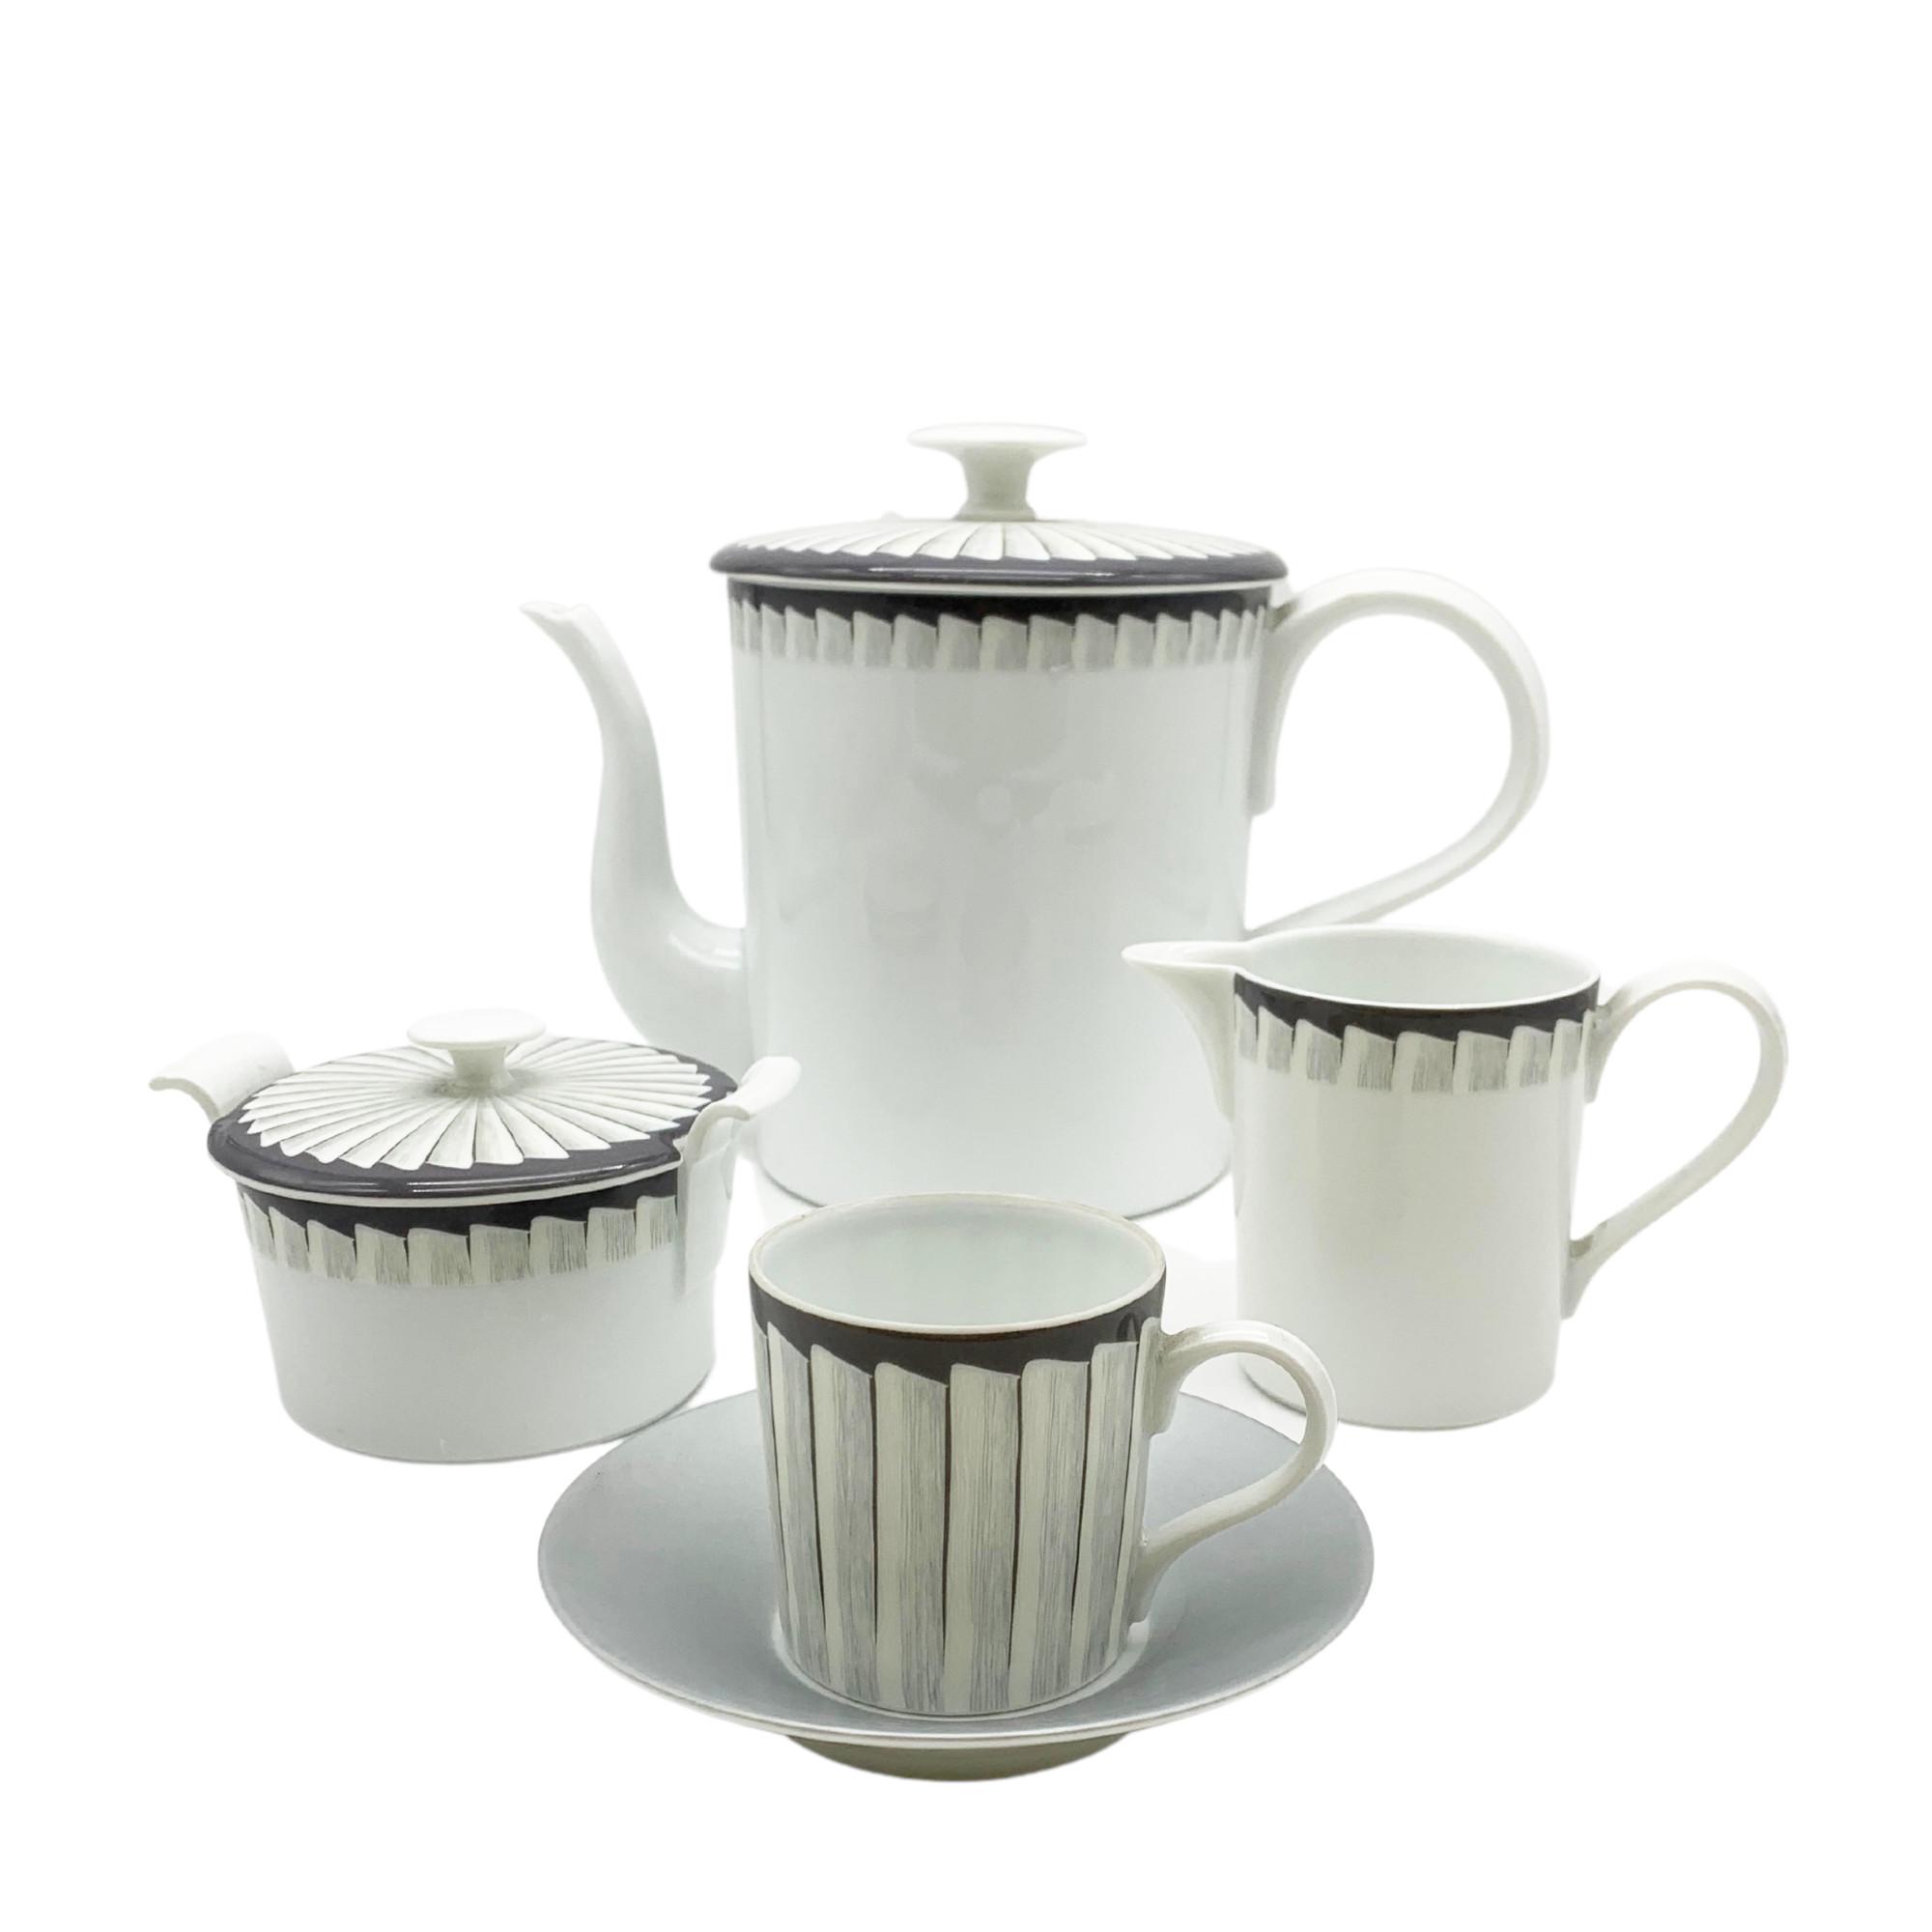 servizio caffè Jl Coquet coffee set sconto discount